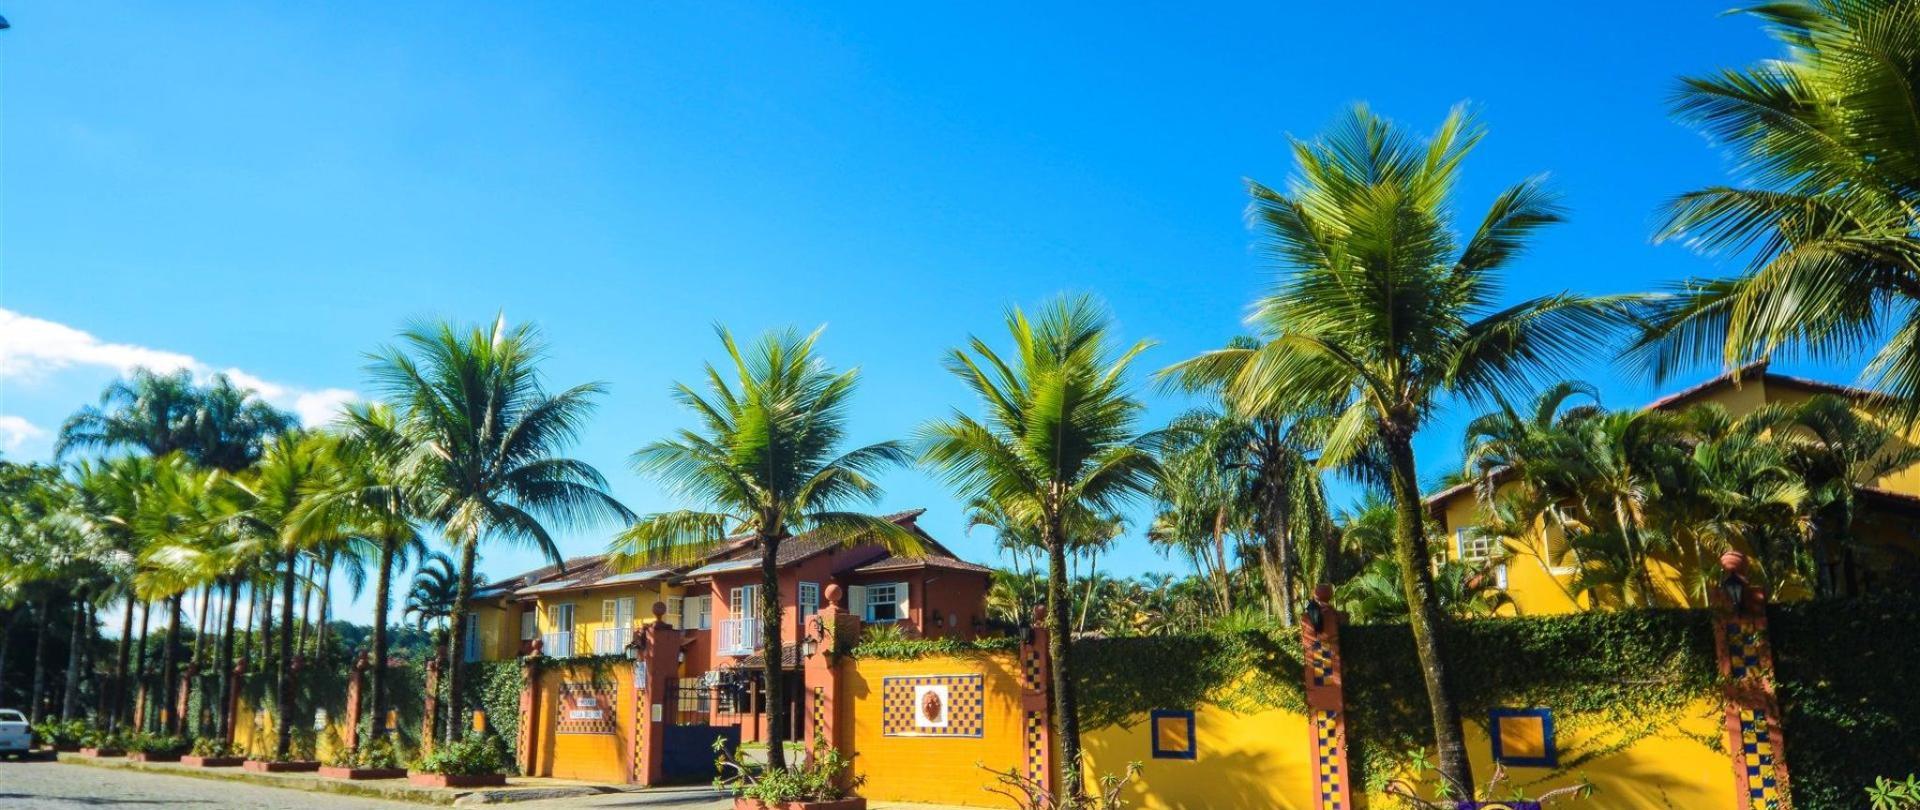 Pousada Villa del Sol - Paraty - Brasil3.jpg